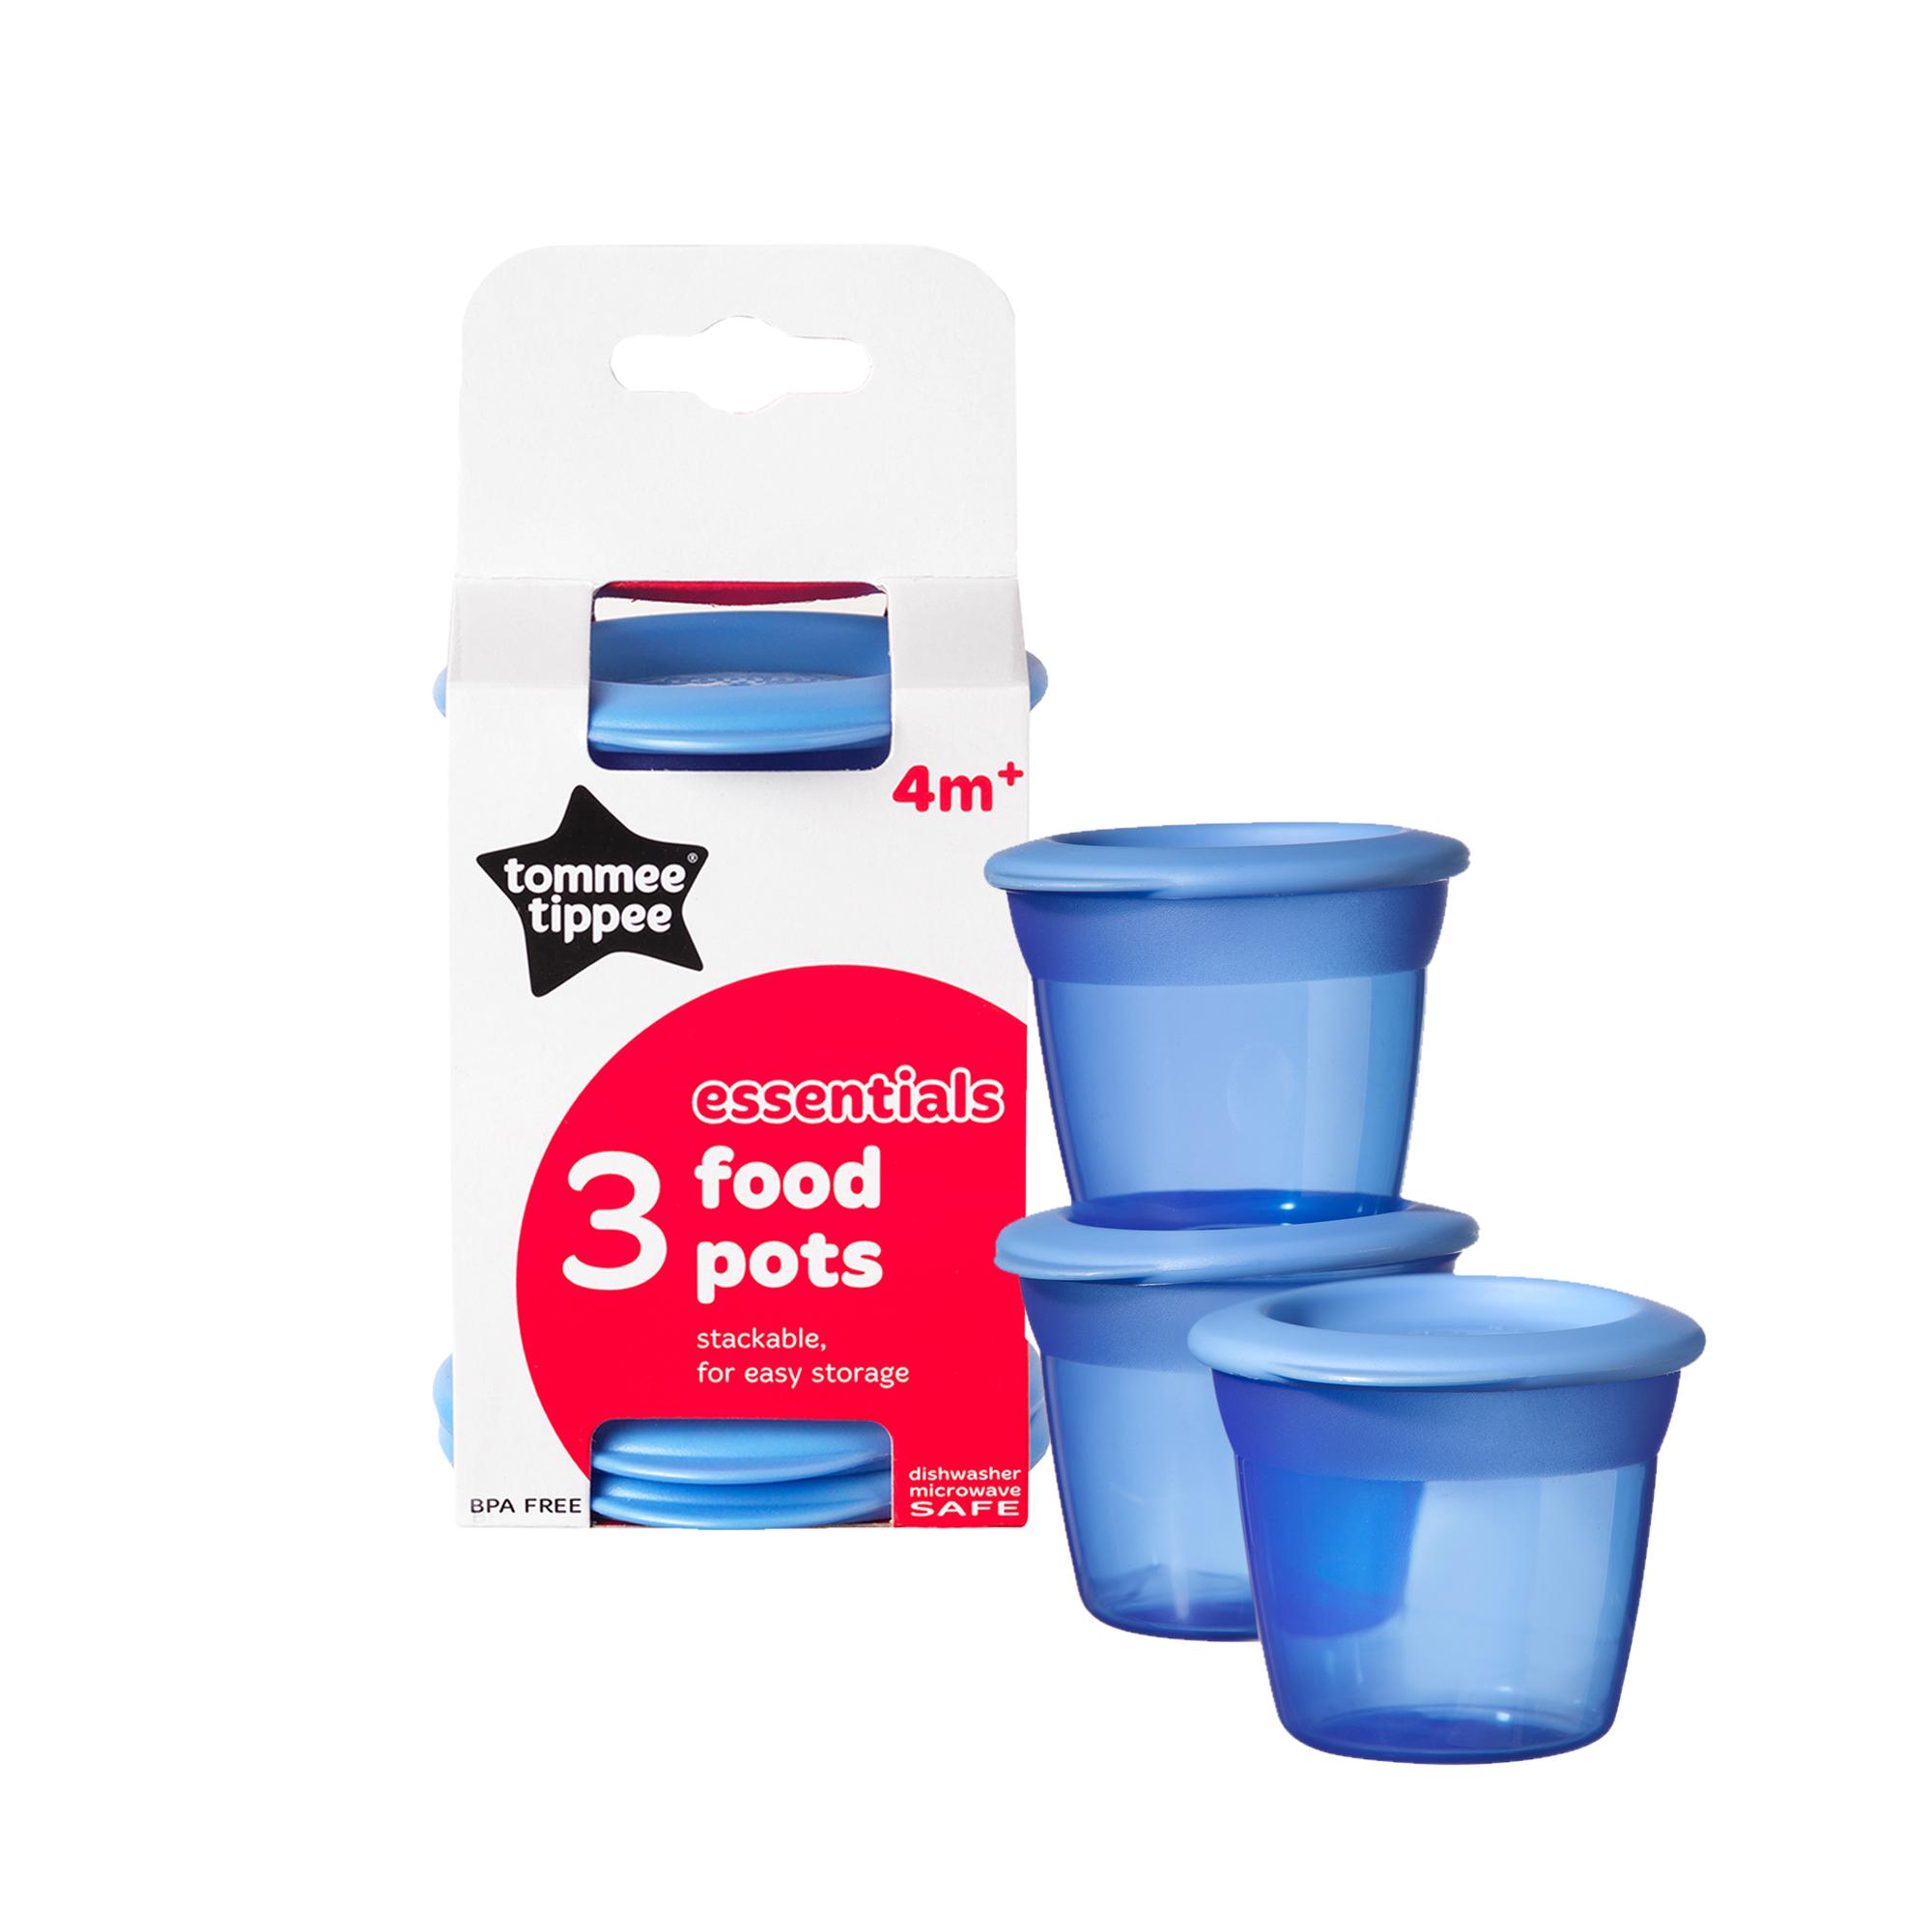 Recipiente de stocare hrana cu capac, Tommee Tippee, 3 buc, Albastru